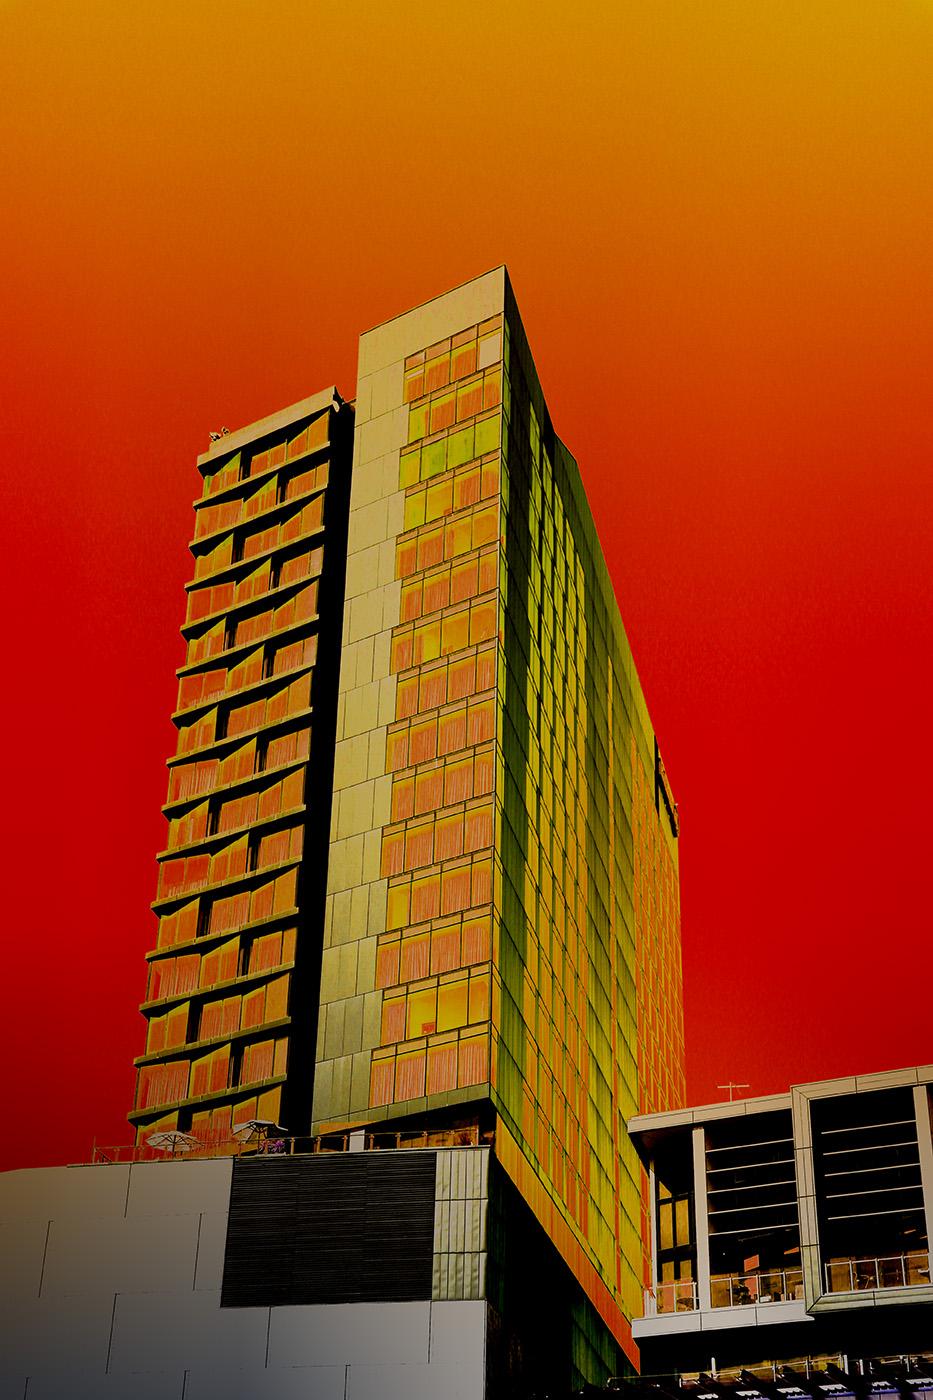 Hot Building